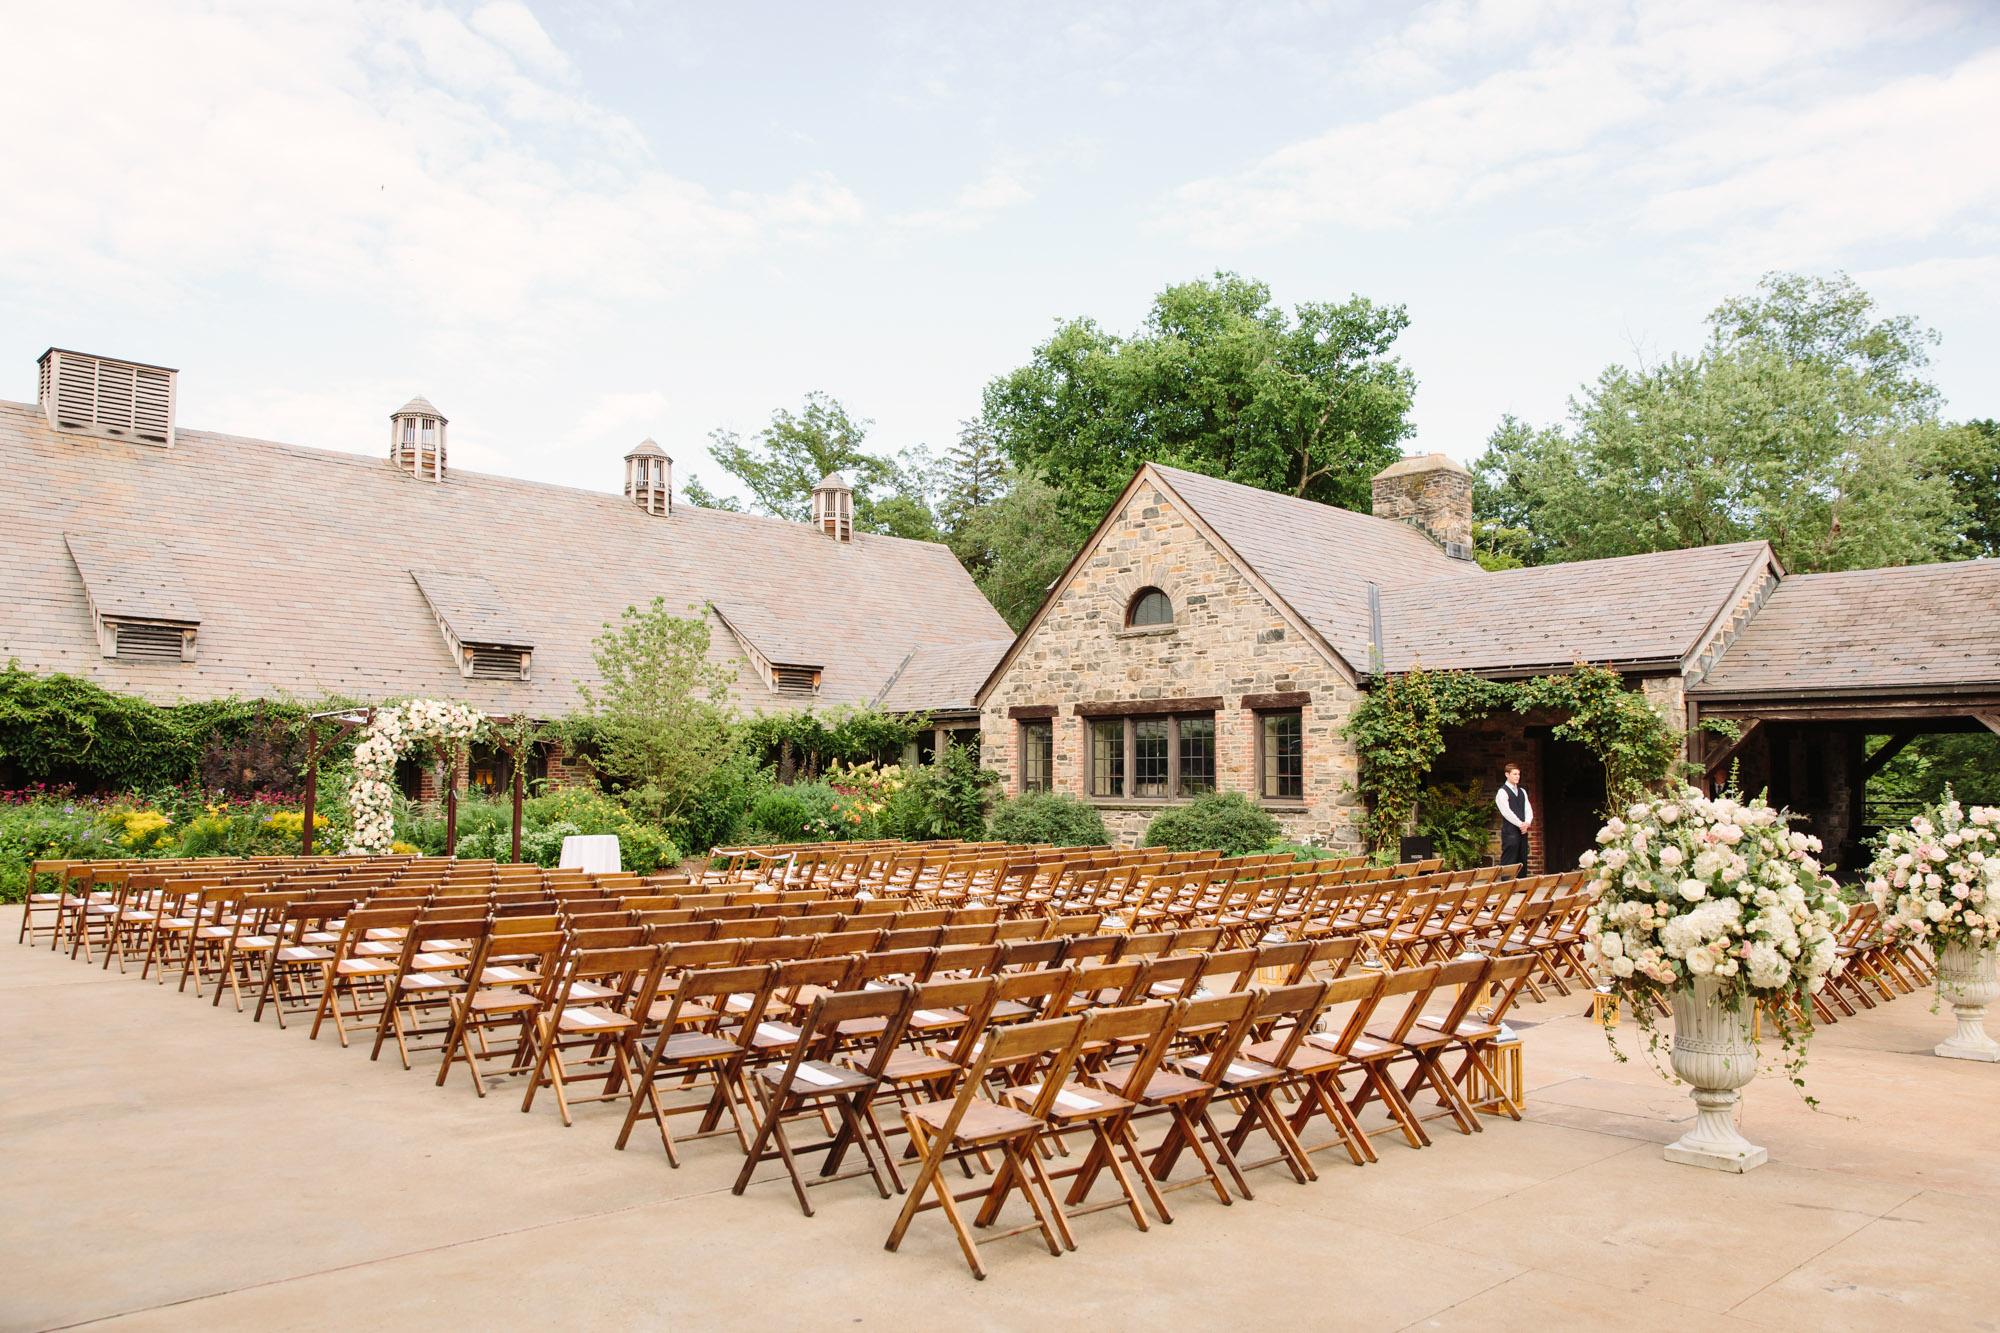 33_Jessica_Ted_Blue_Hill_Stone_Barns_Wedding_Pocantico_NY_Tanya_Salazar_Photography_102.jpg